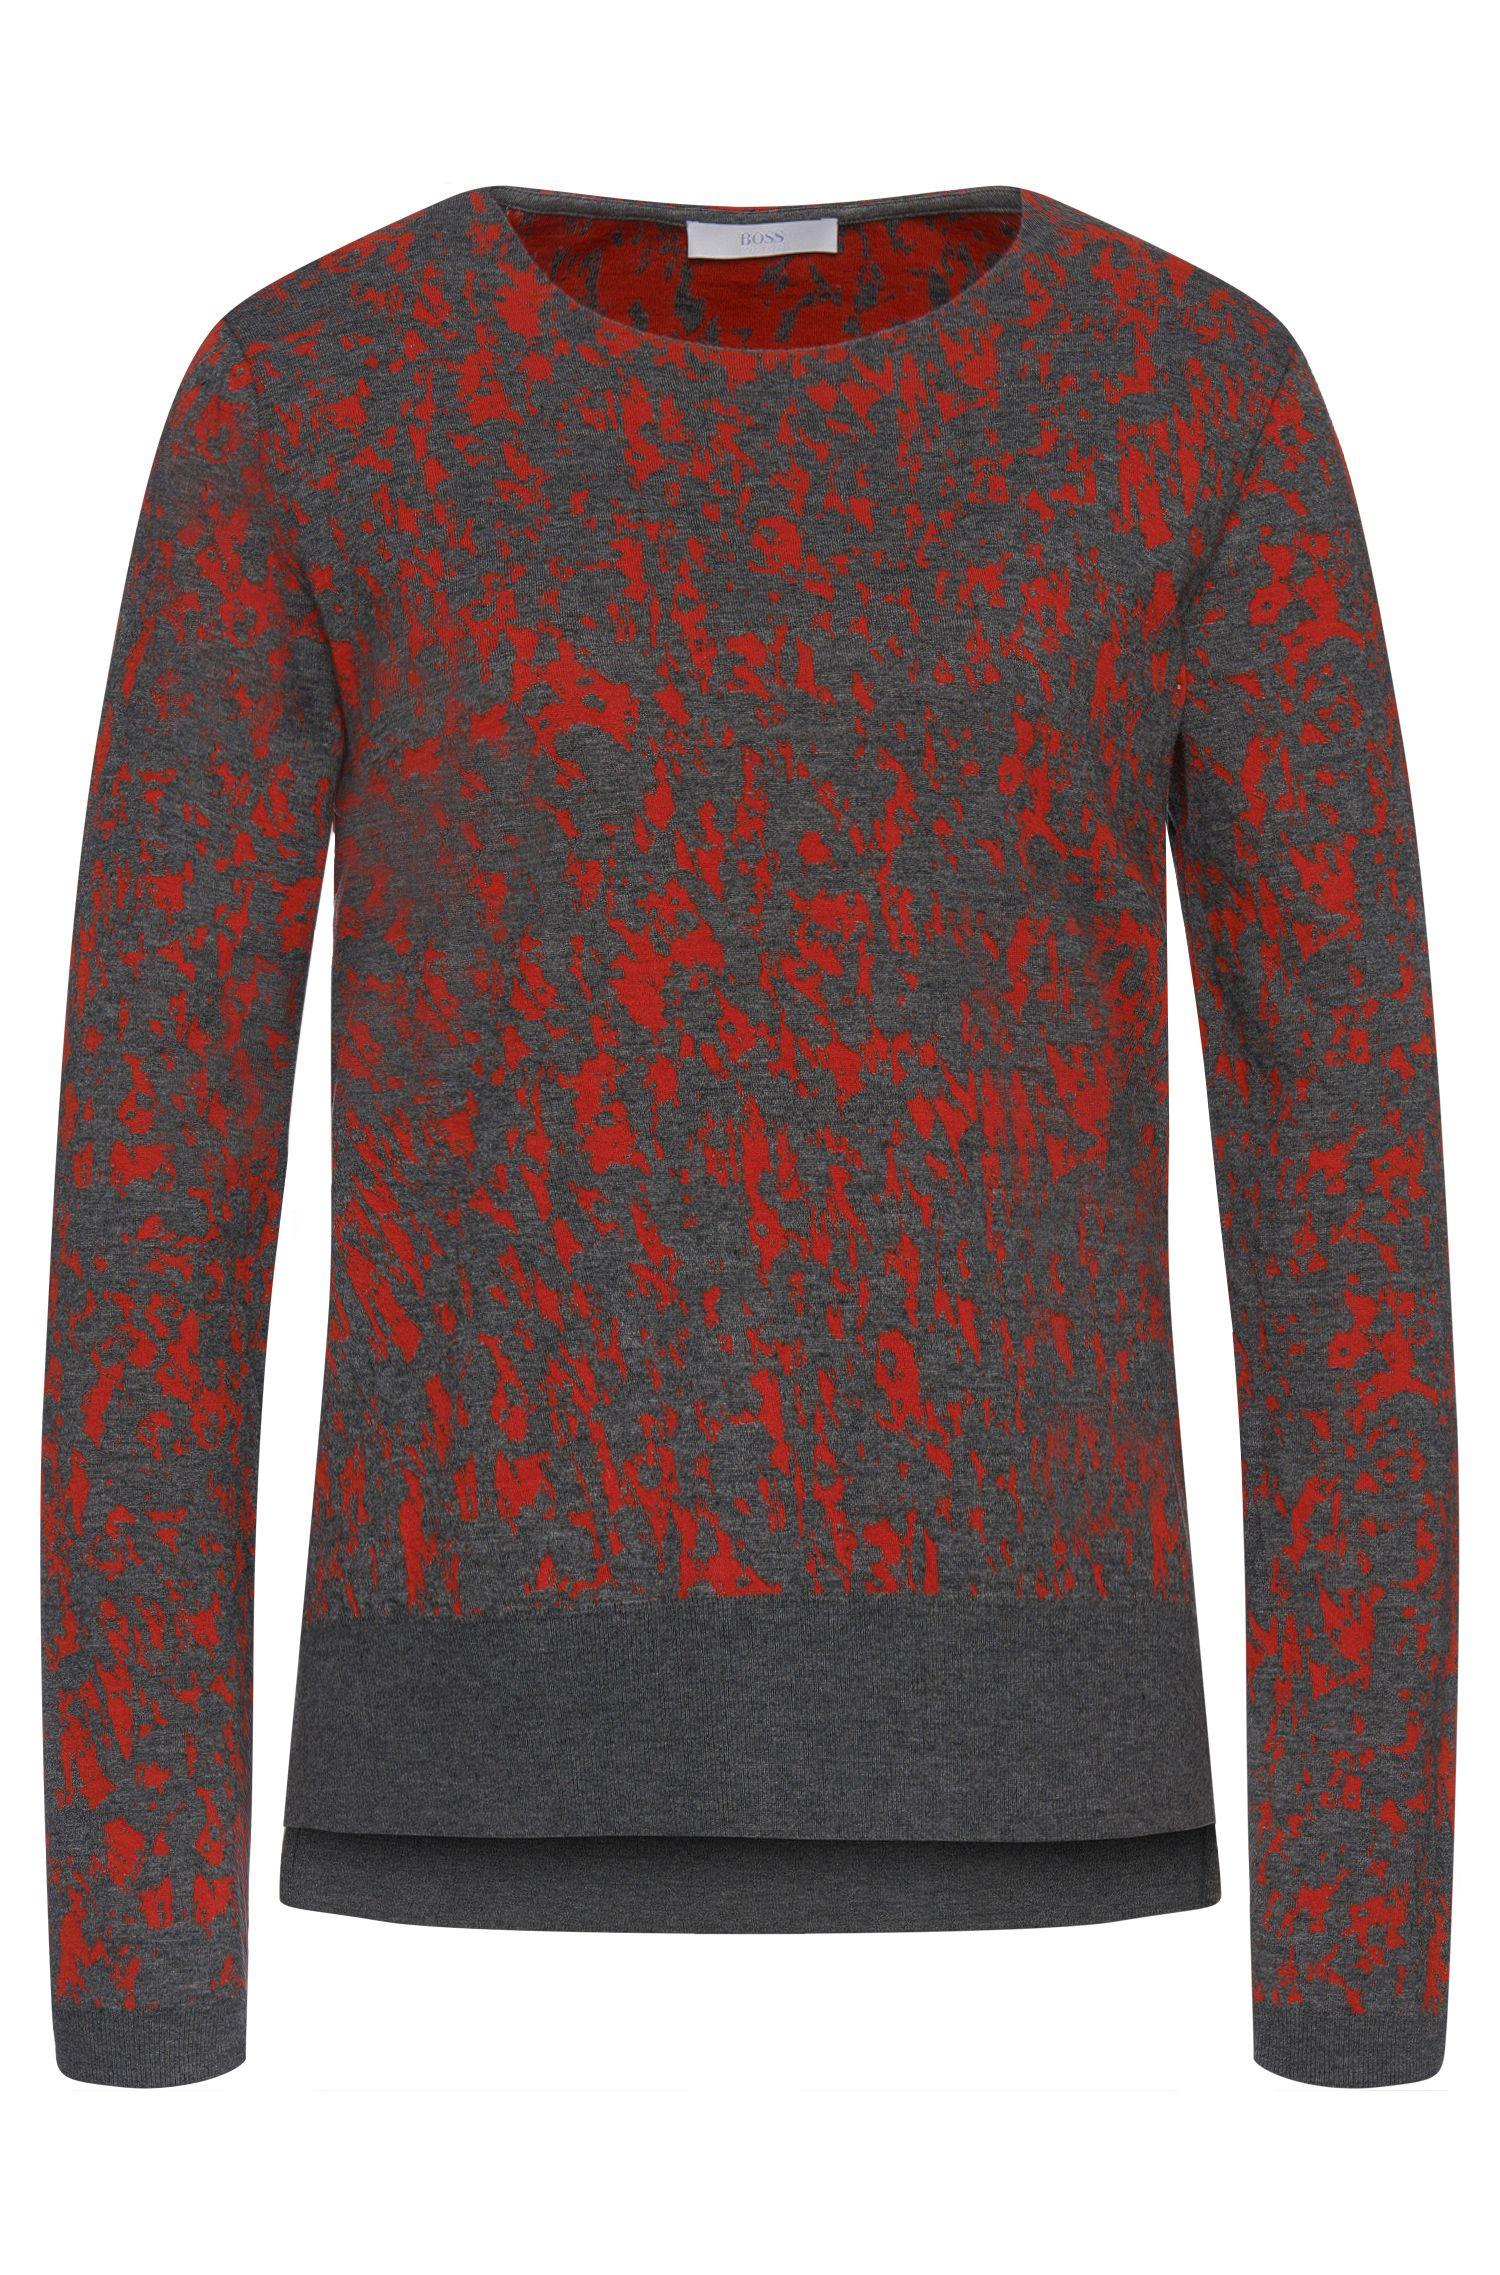 'Emka' | Cotton Blend Abstract Intarsia Sweater